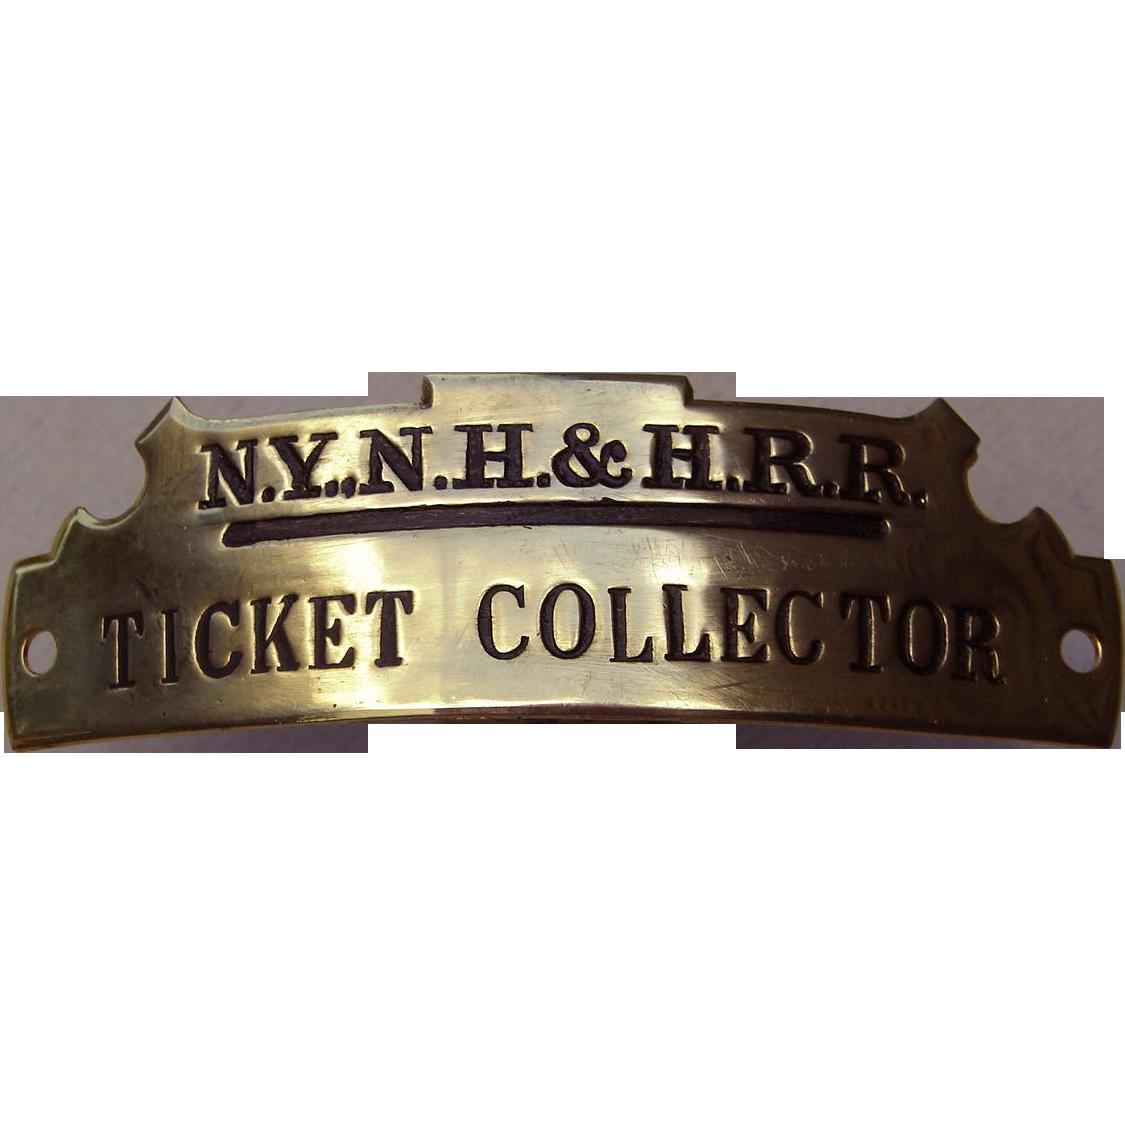 Vintage New York, New Haven & Hartford Railroad Ticket Collector Hat Cap Badge